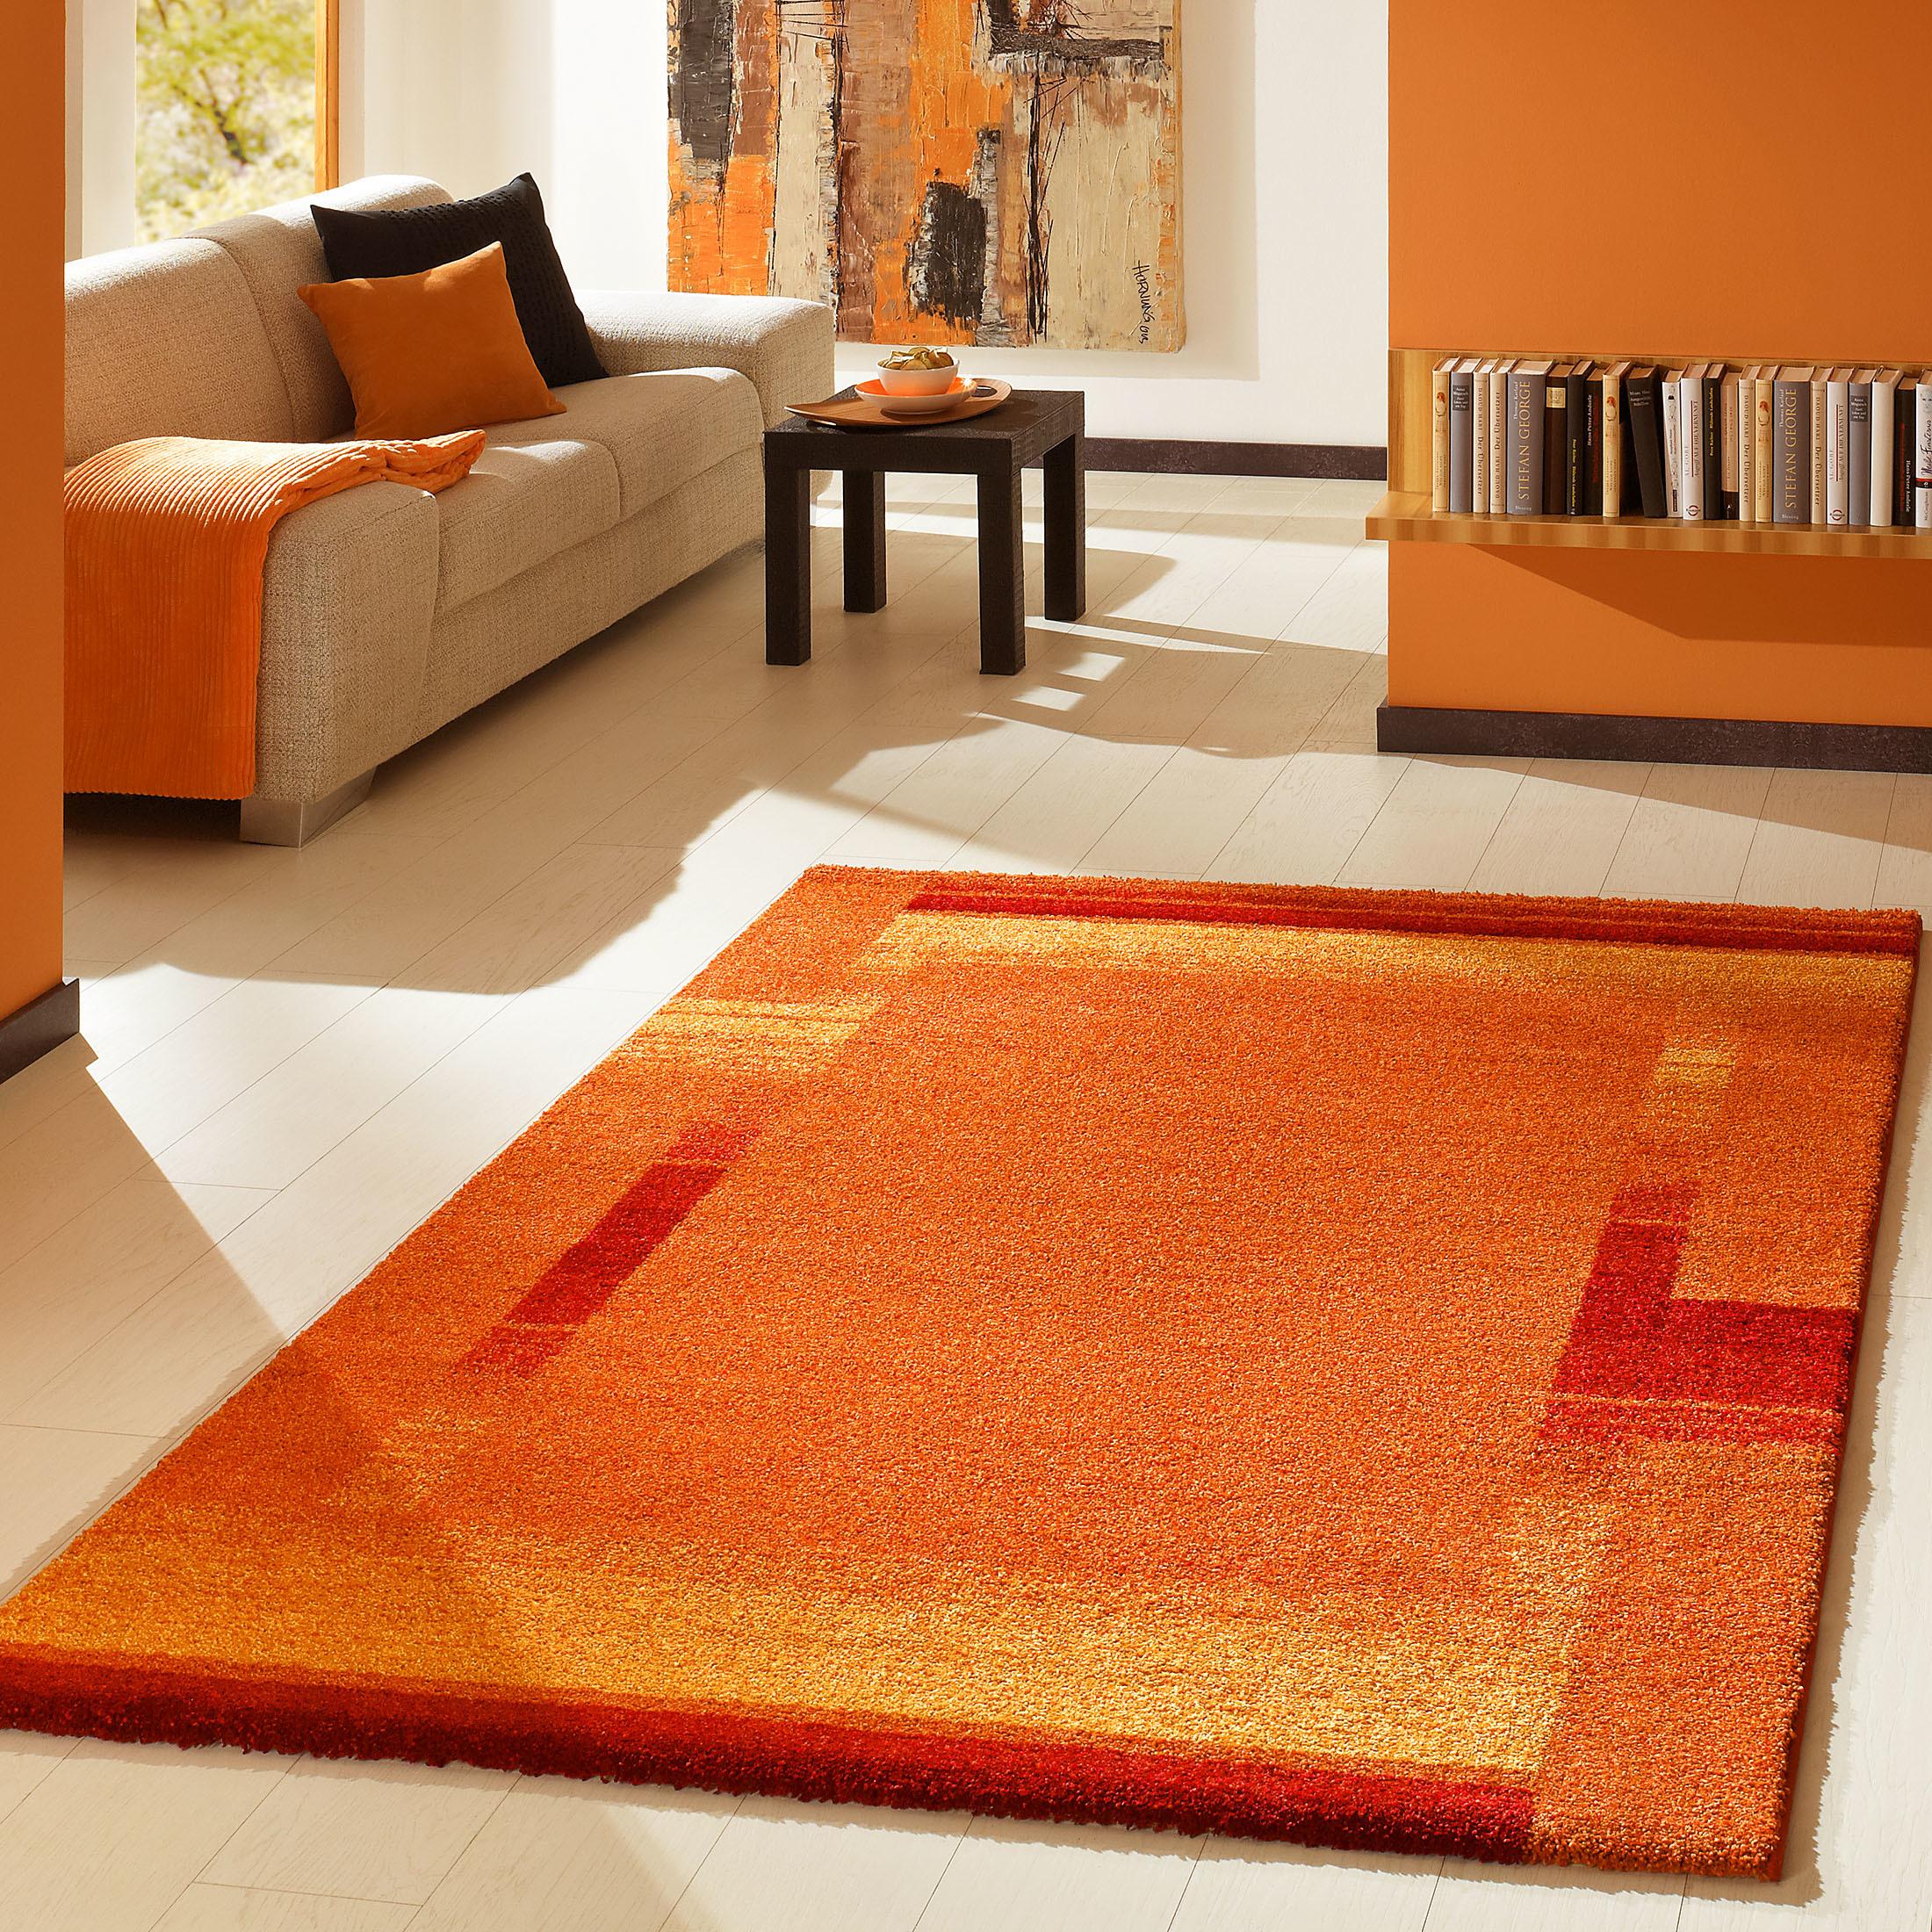 designer teppich von kibek night life in orange 240 x. Black Bedroom Furniture Sets. Home Design Ideas